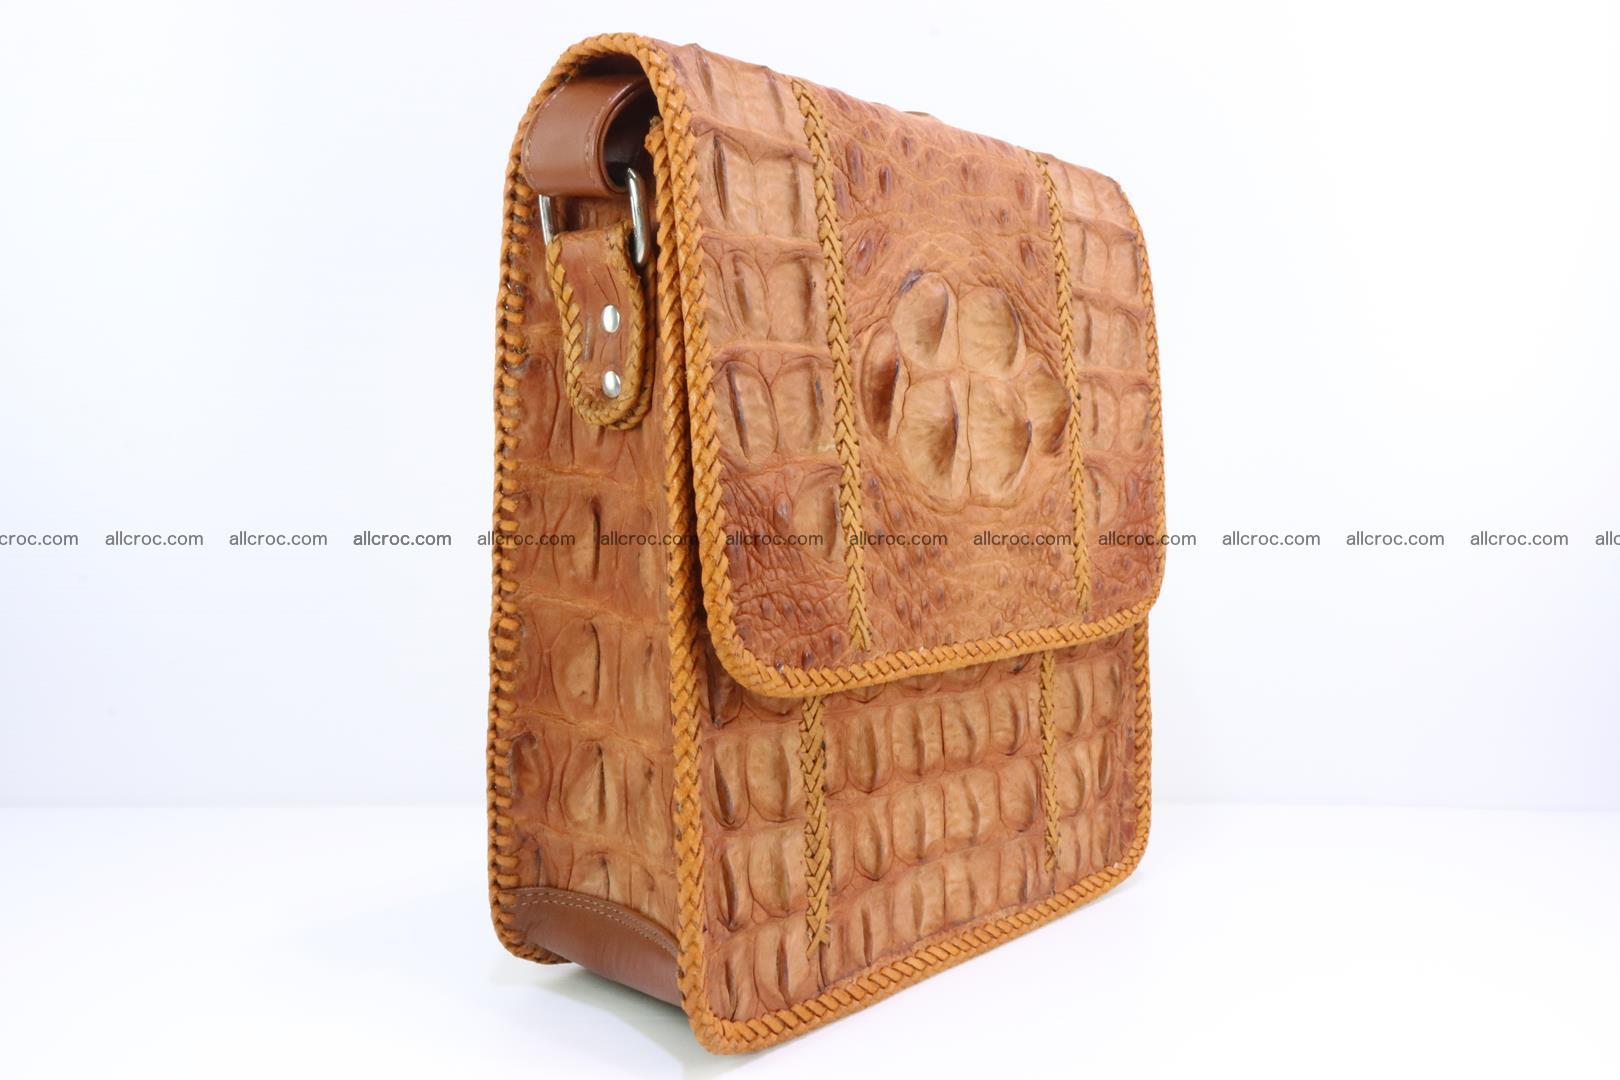 Сrocodile skin shoulder bag with braided edges 141 Foto 1